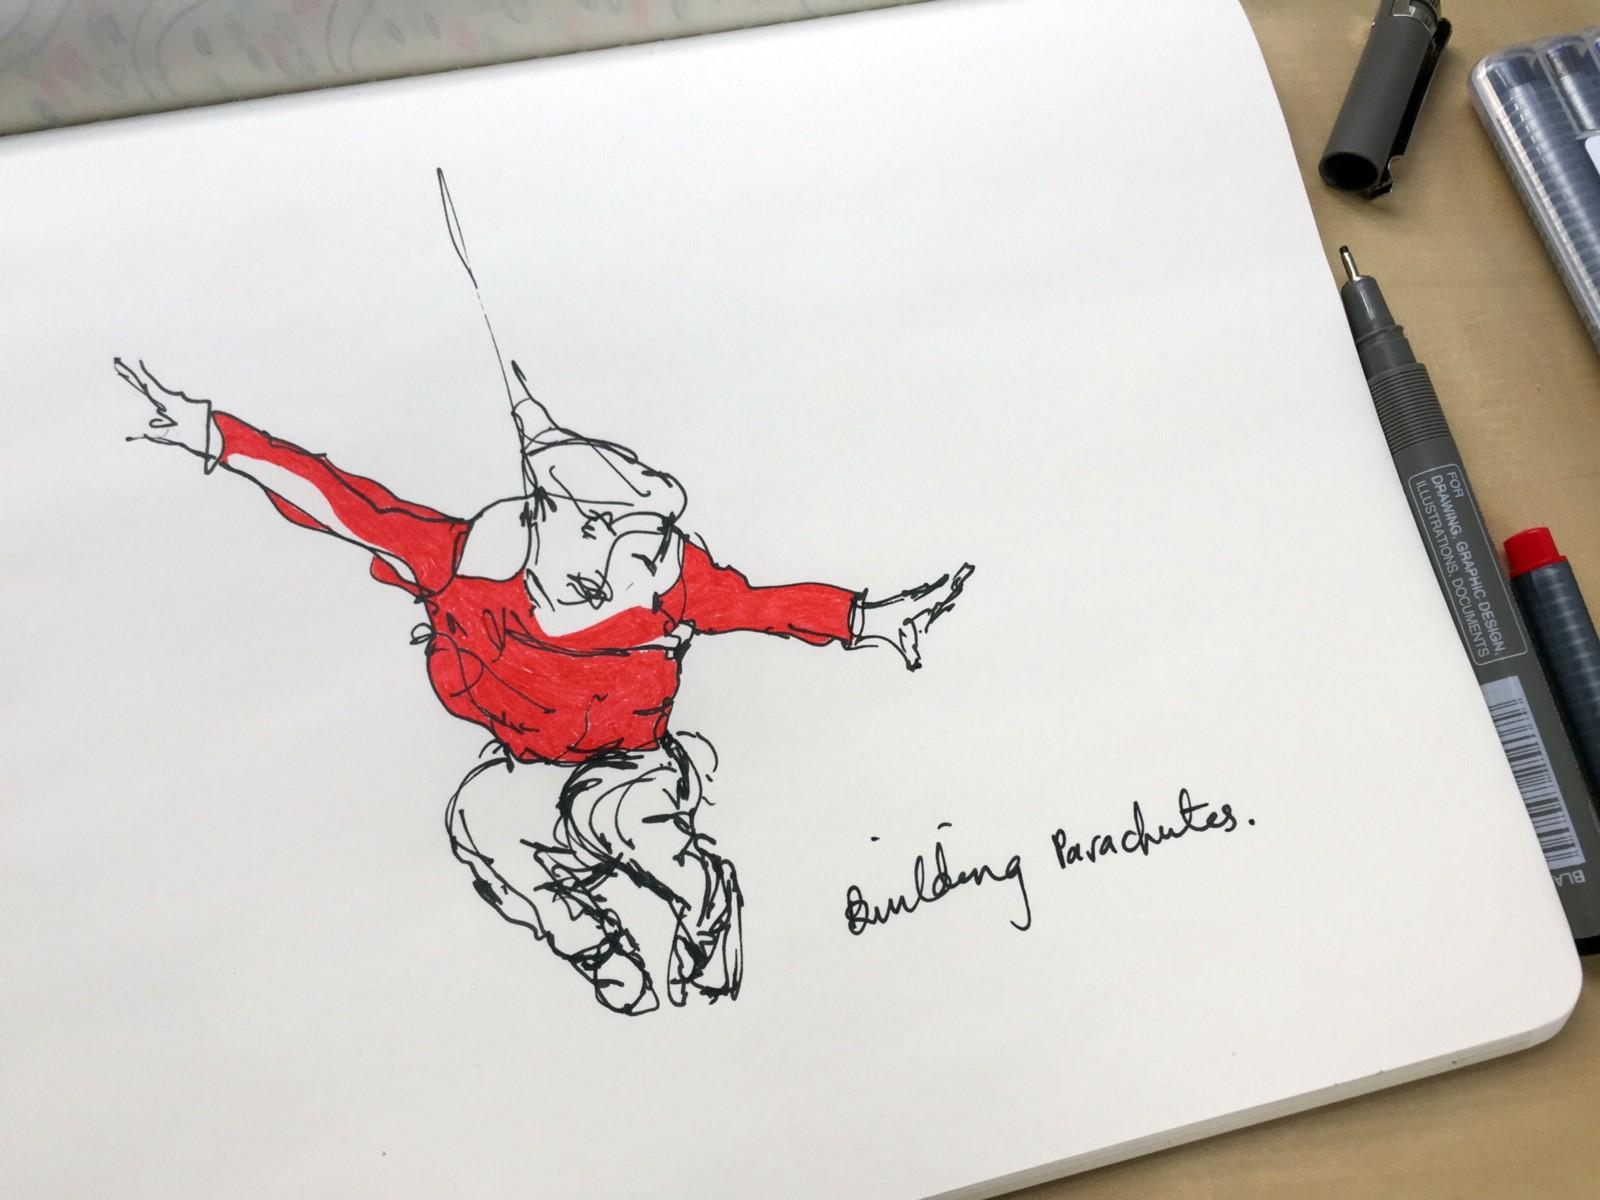 Bulding parachutes. Drawing by Luke Hockley